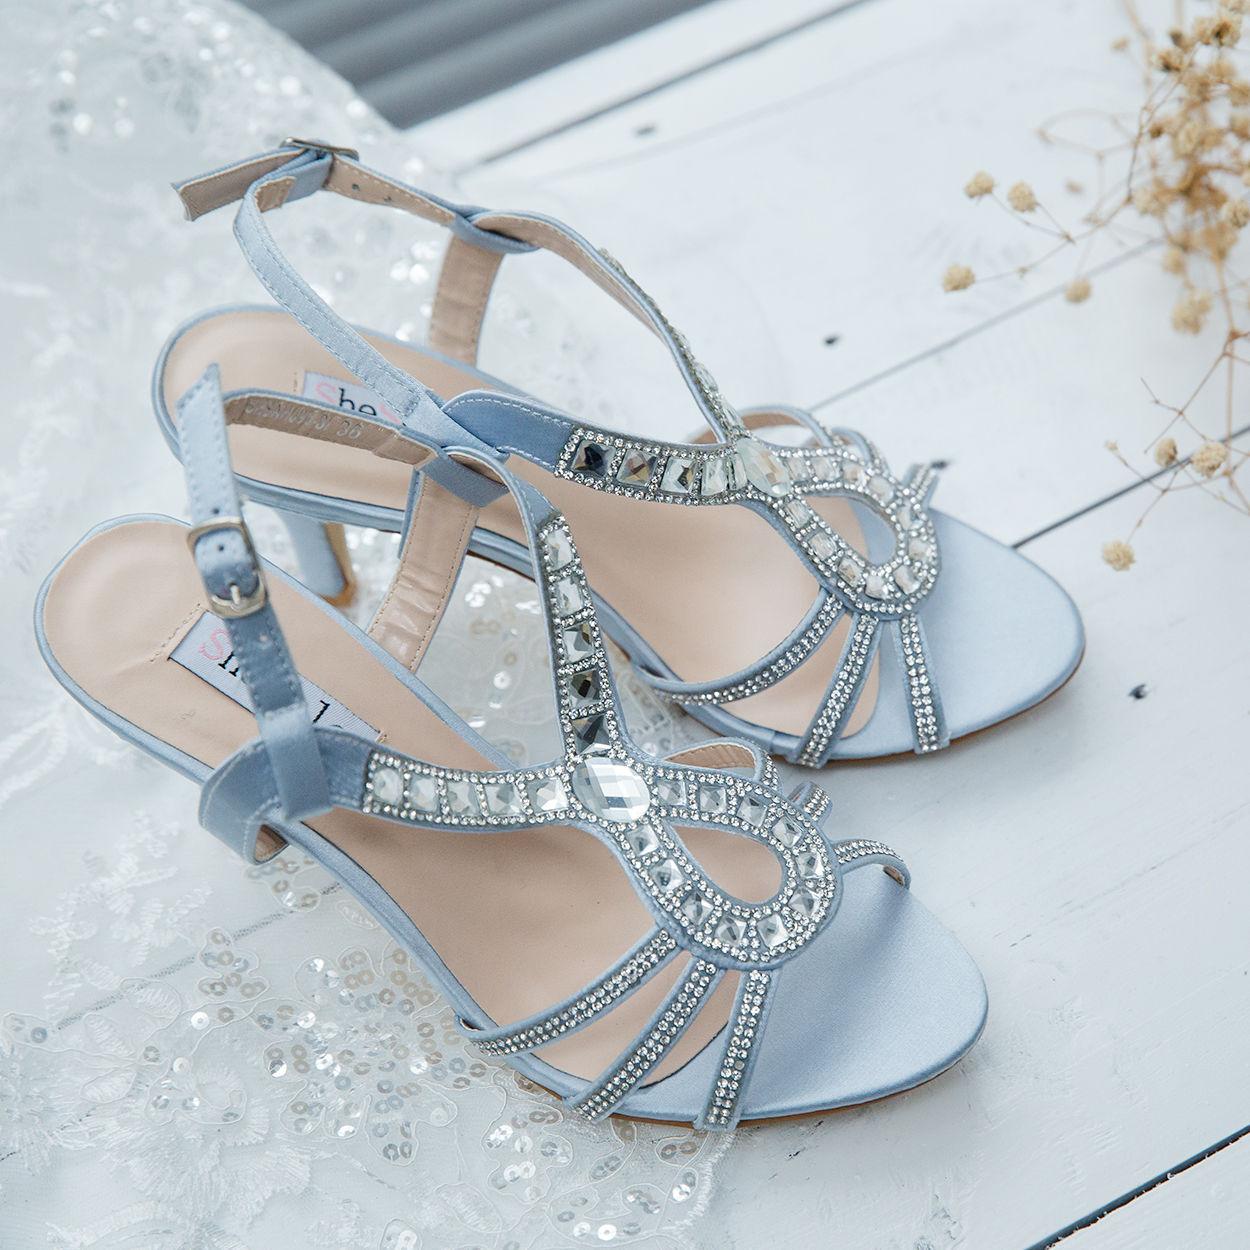 SheSole Womens Rhinestone High Heels Sandals Wedding Dresses Shoes ...